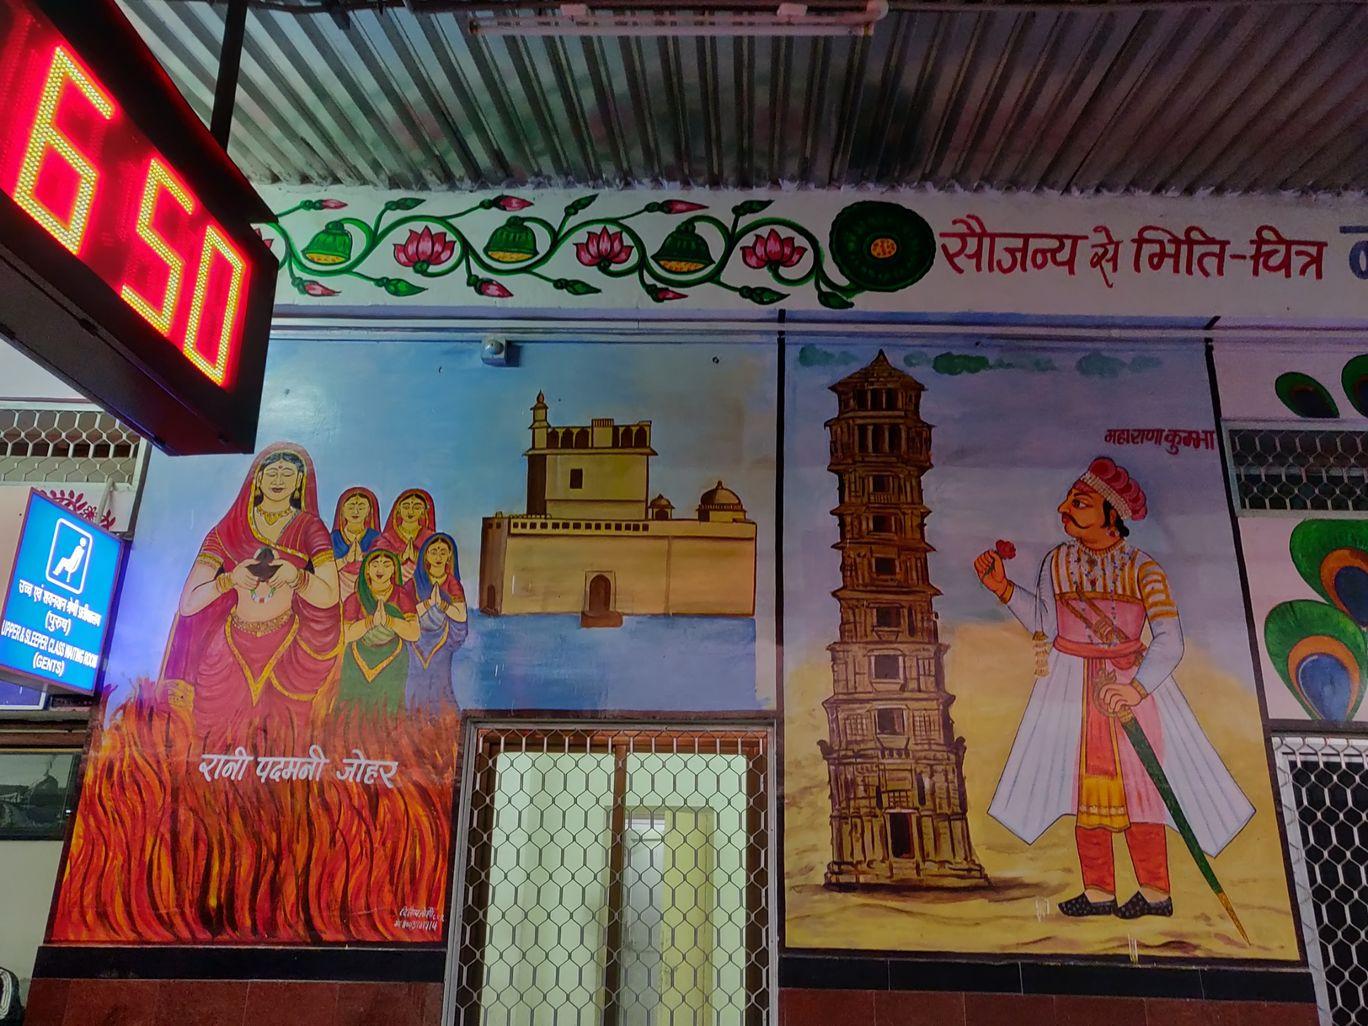 Photo of Chittorgarh By Adarsha Dash